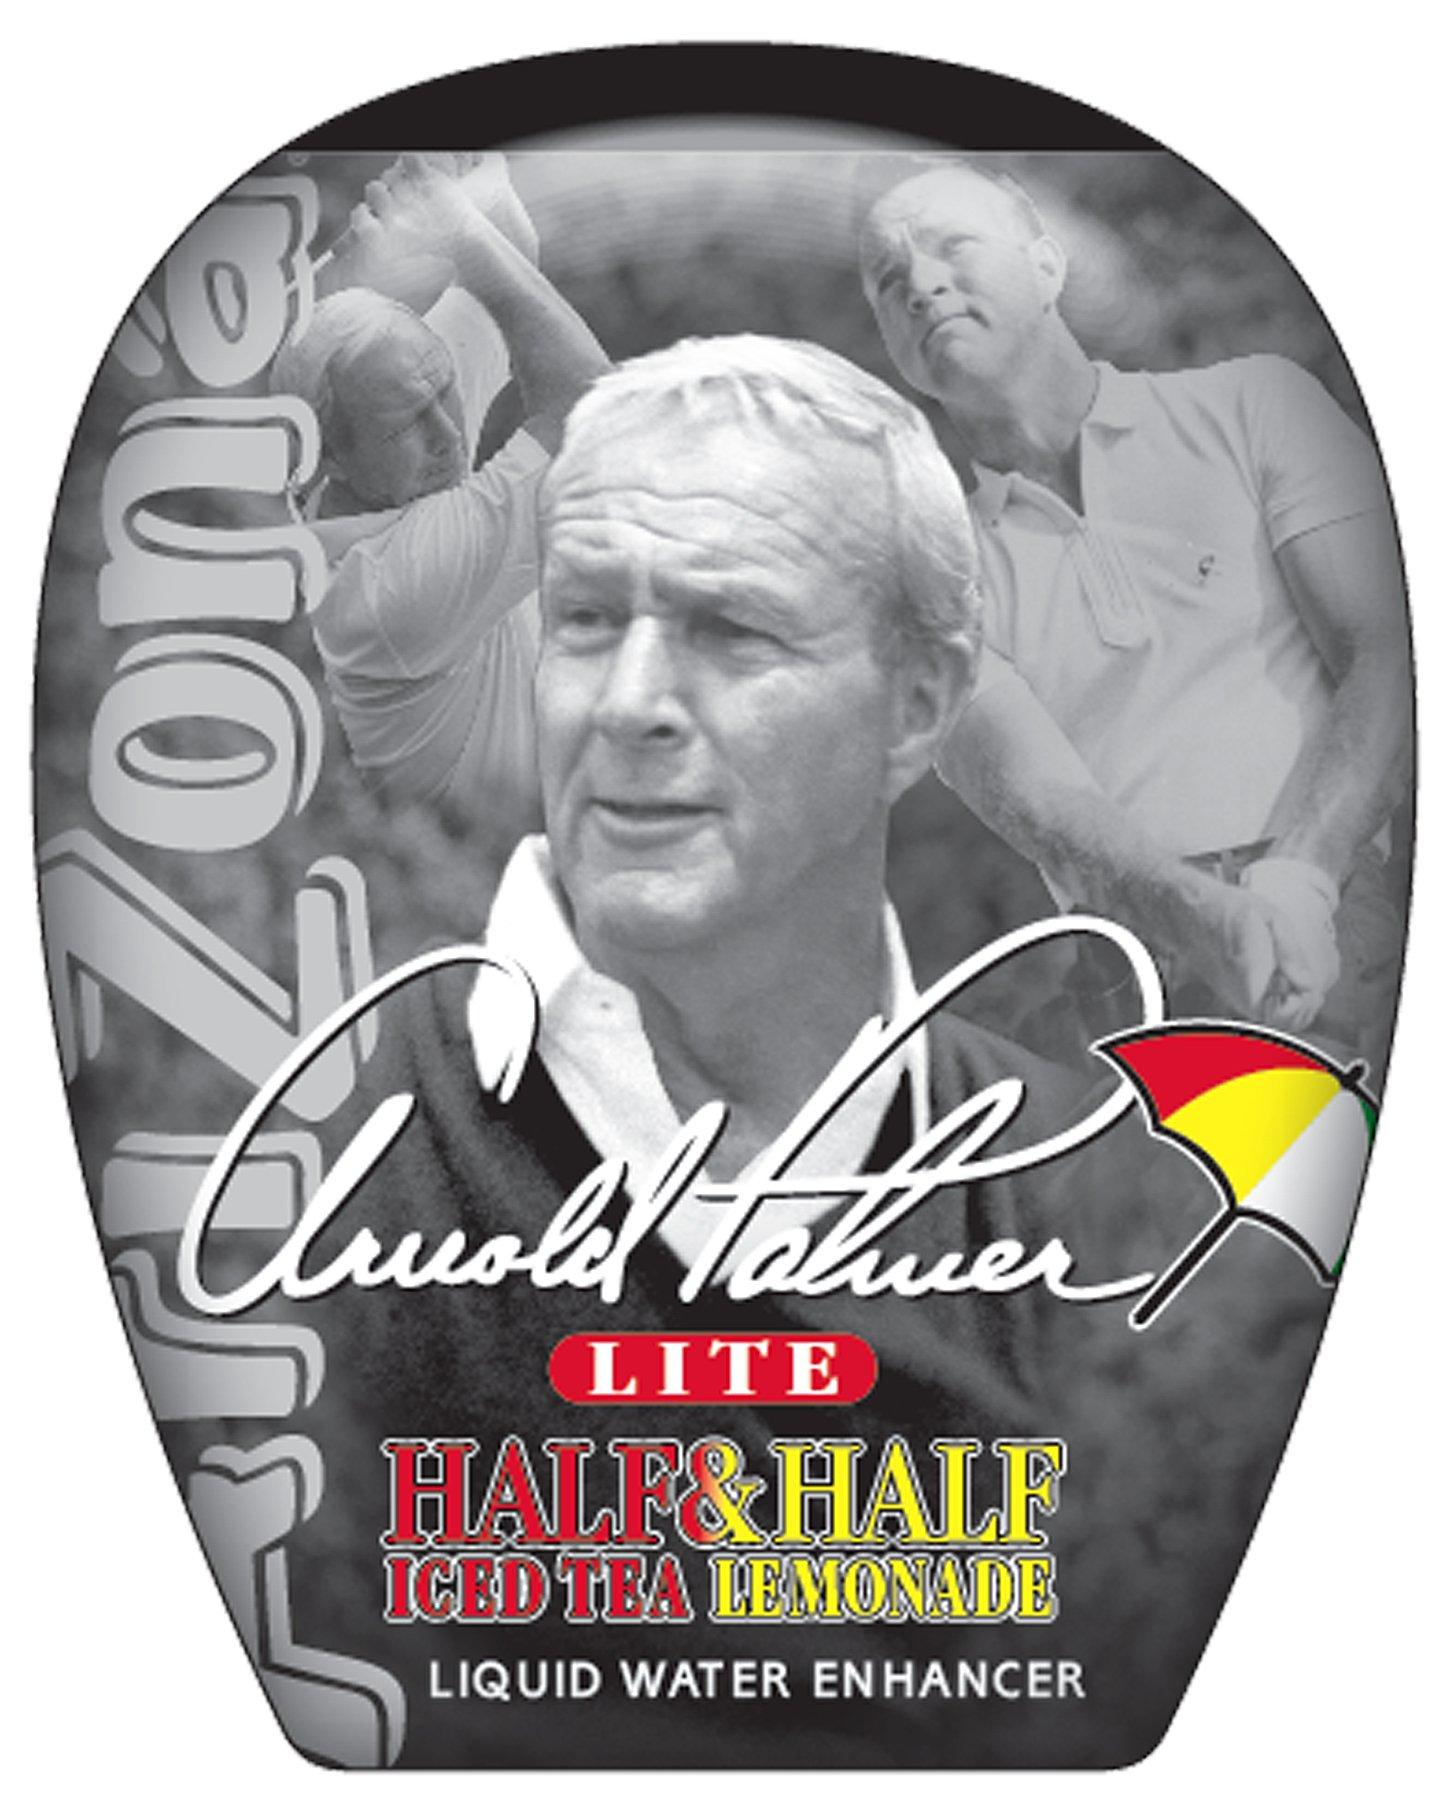 Arizona Water Enhancer Arnold Palmer Half Iced Tea & Half Lemonade1.9 Oz (10 Pack)